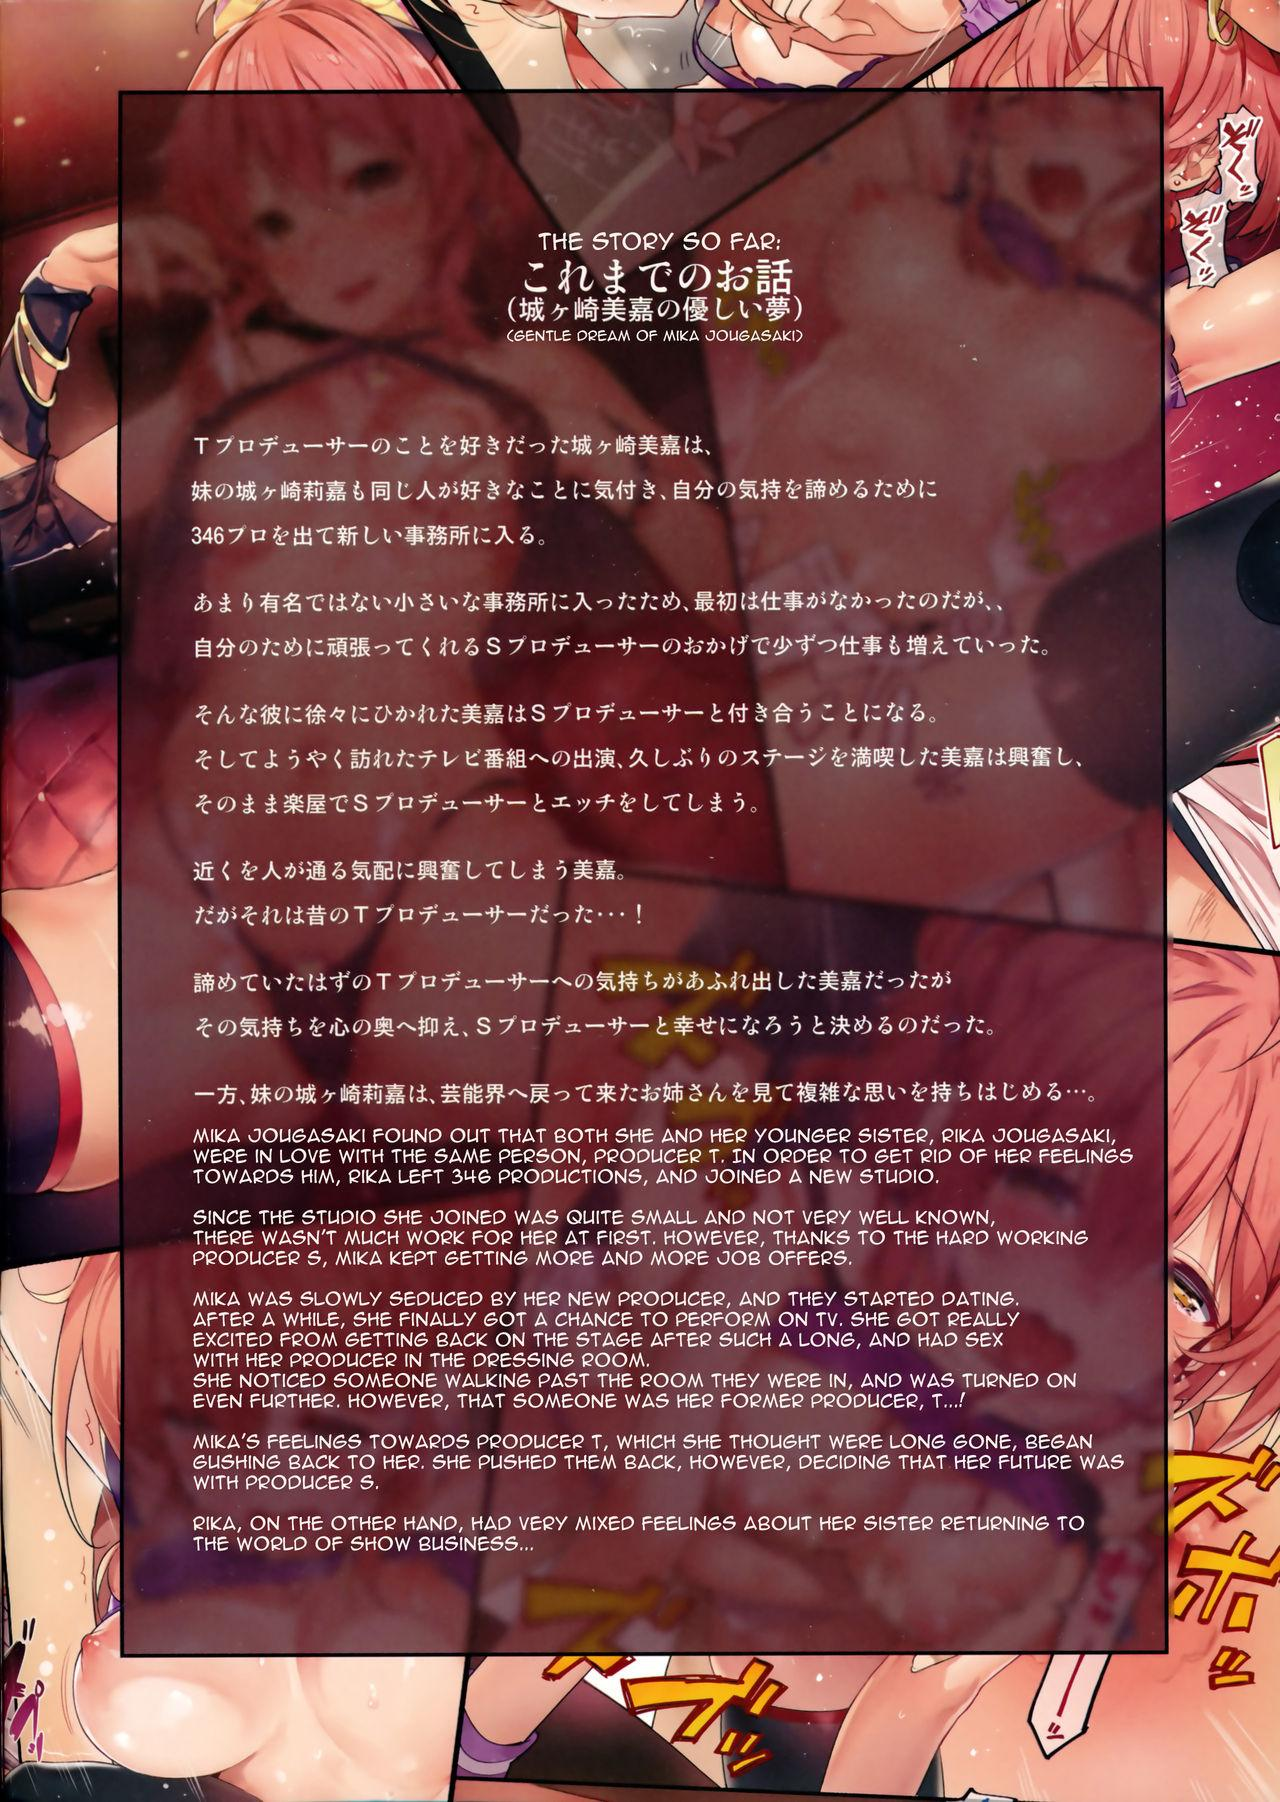 Jougasaki Shimai no Itazura na Yume - Mischievous dream of Jogasaki sisters 1